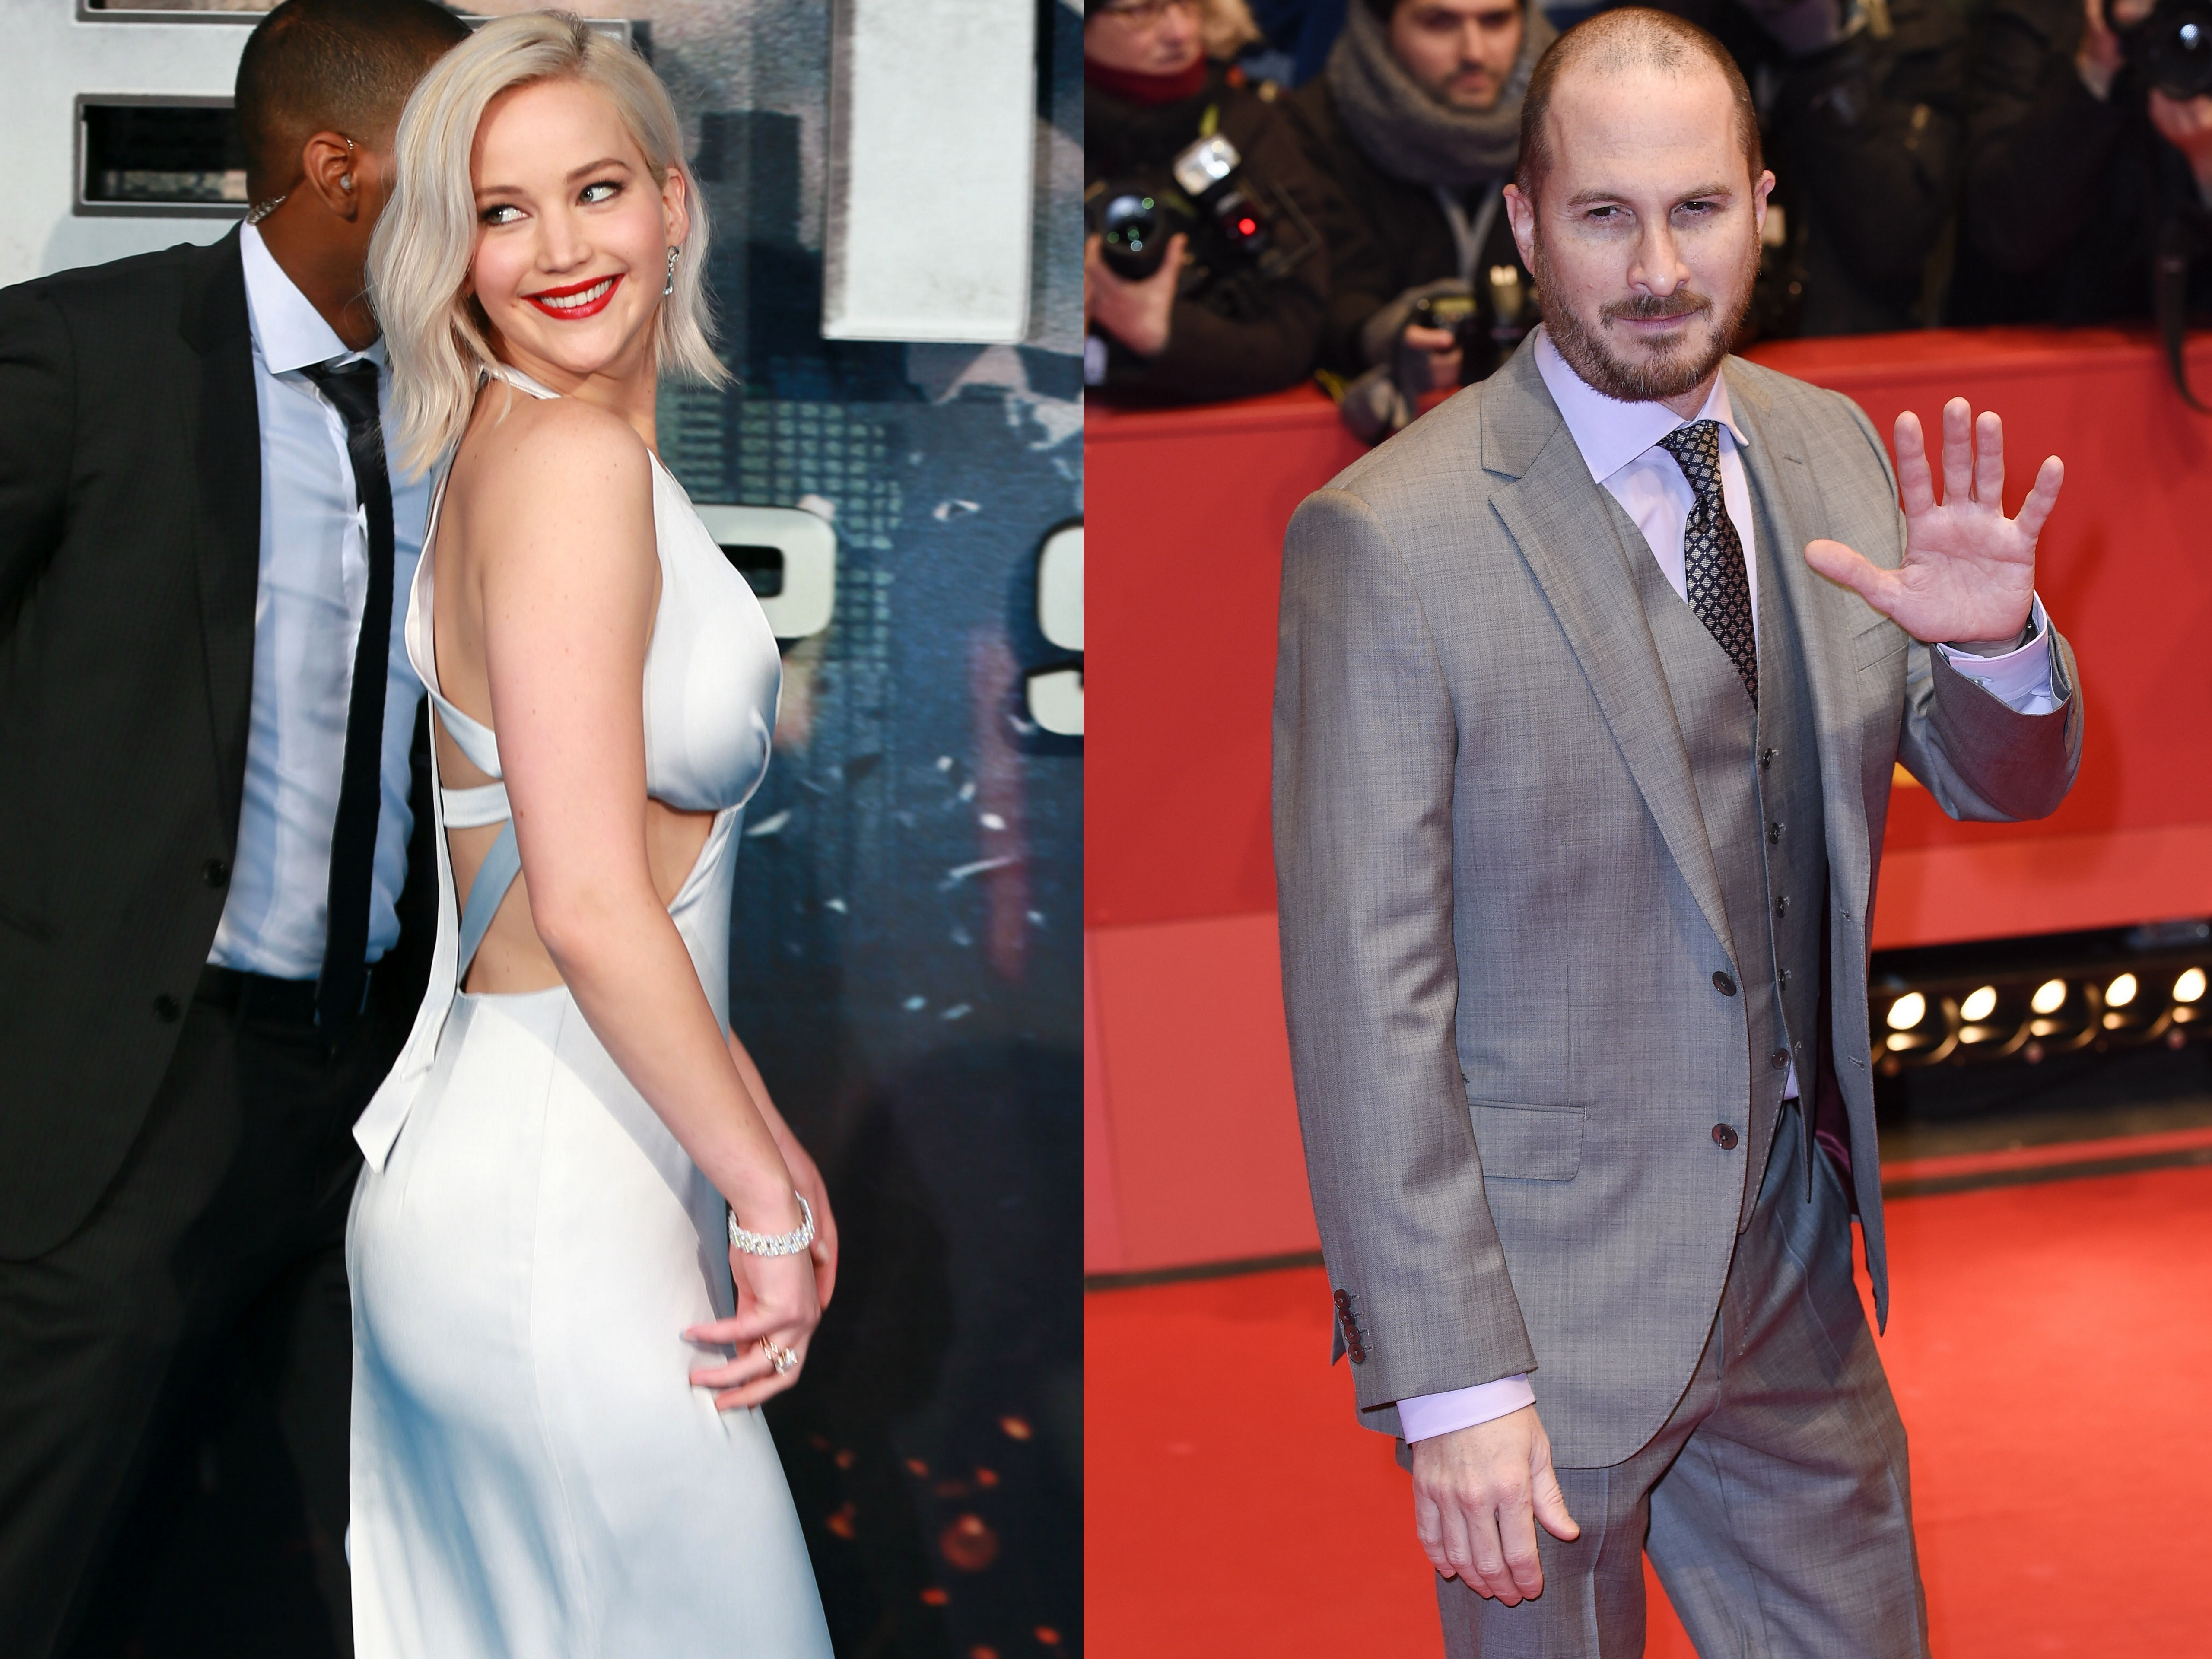 Image result for Jennifer Lawrence and Darren Aronofsky